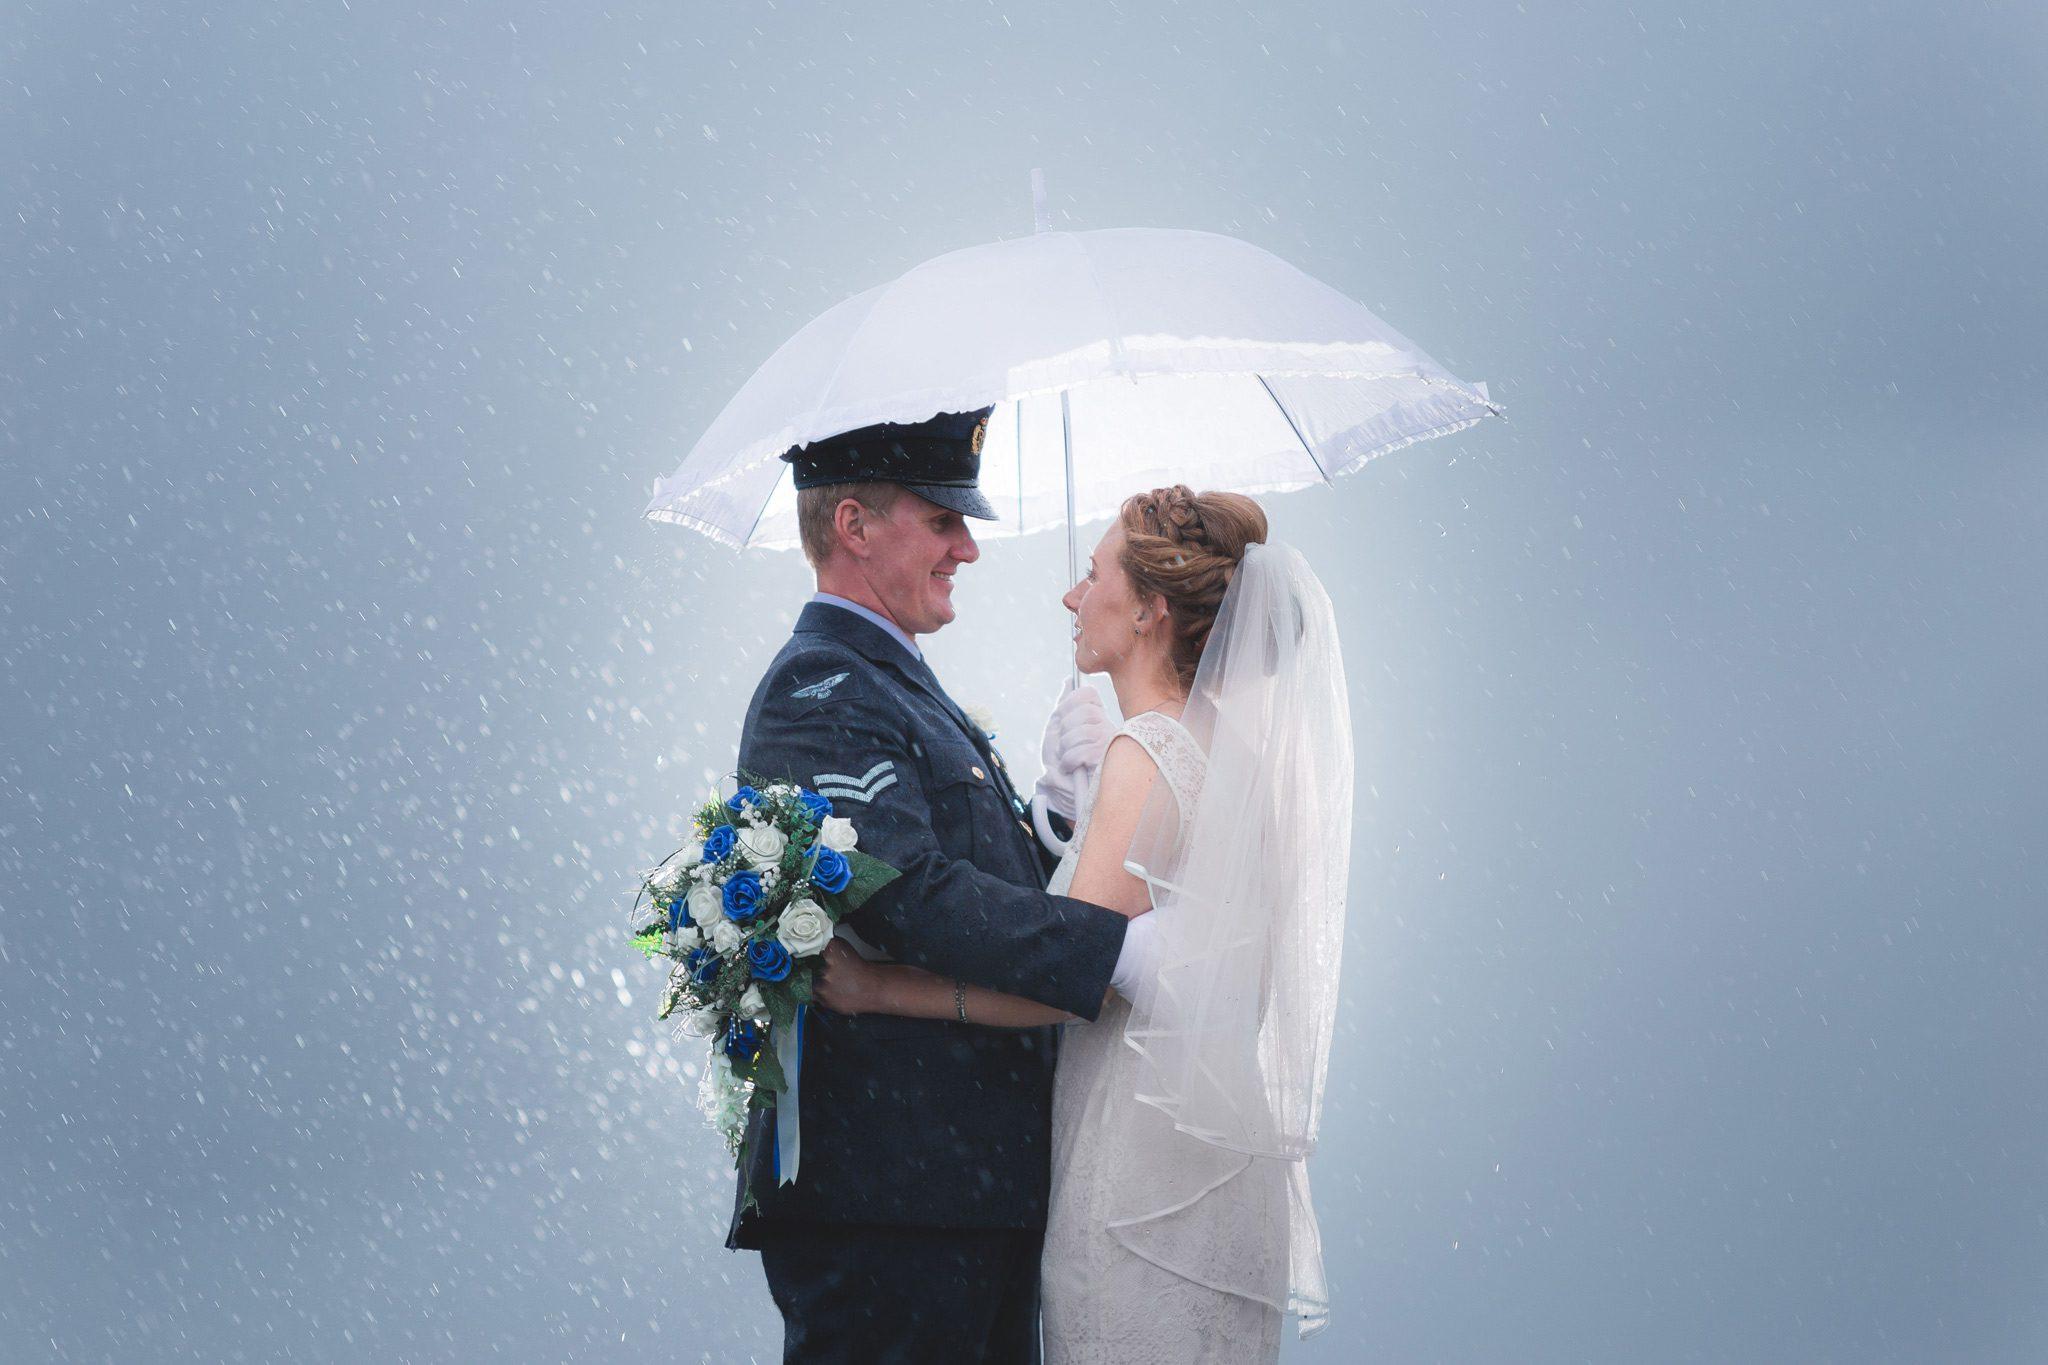 Peak District Wedding Photographer - Curbar Edge - Rain